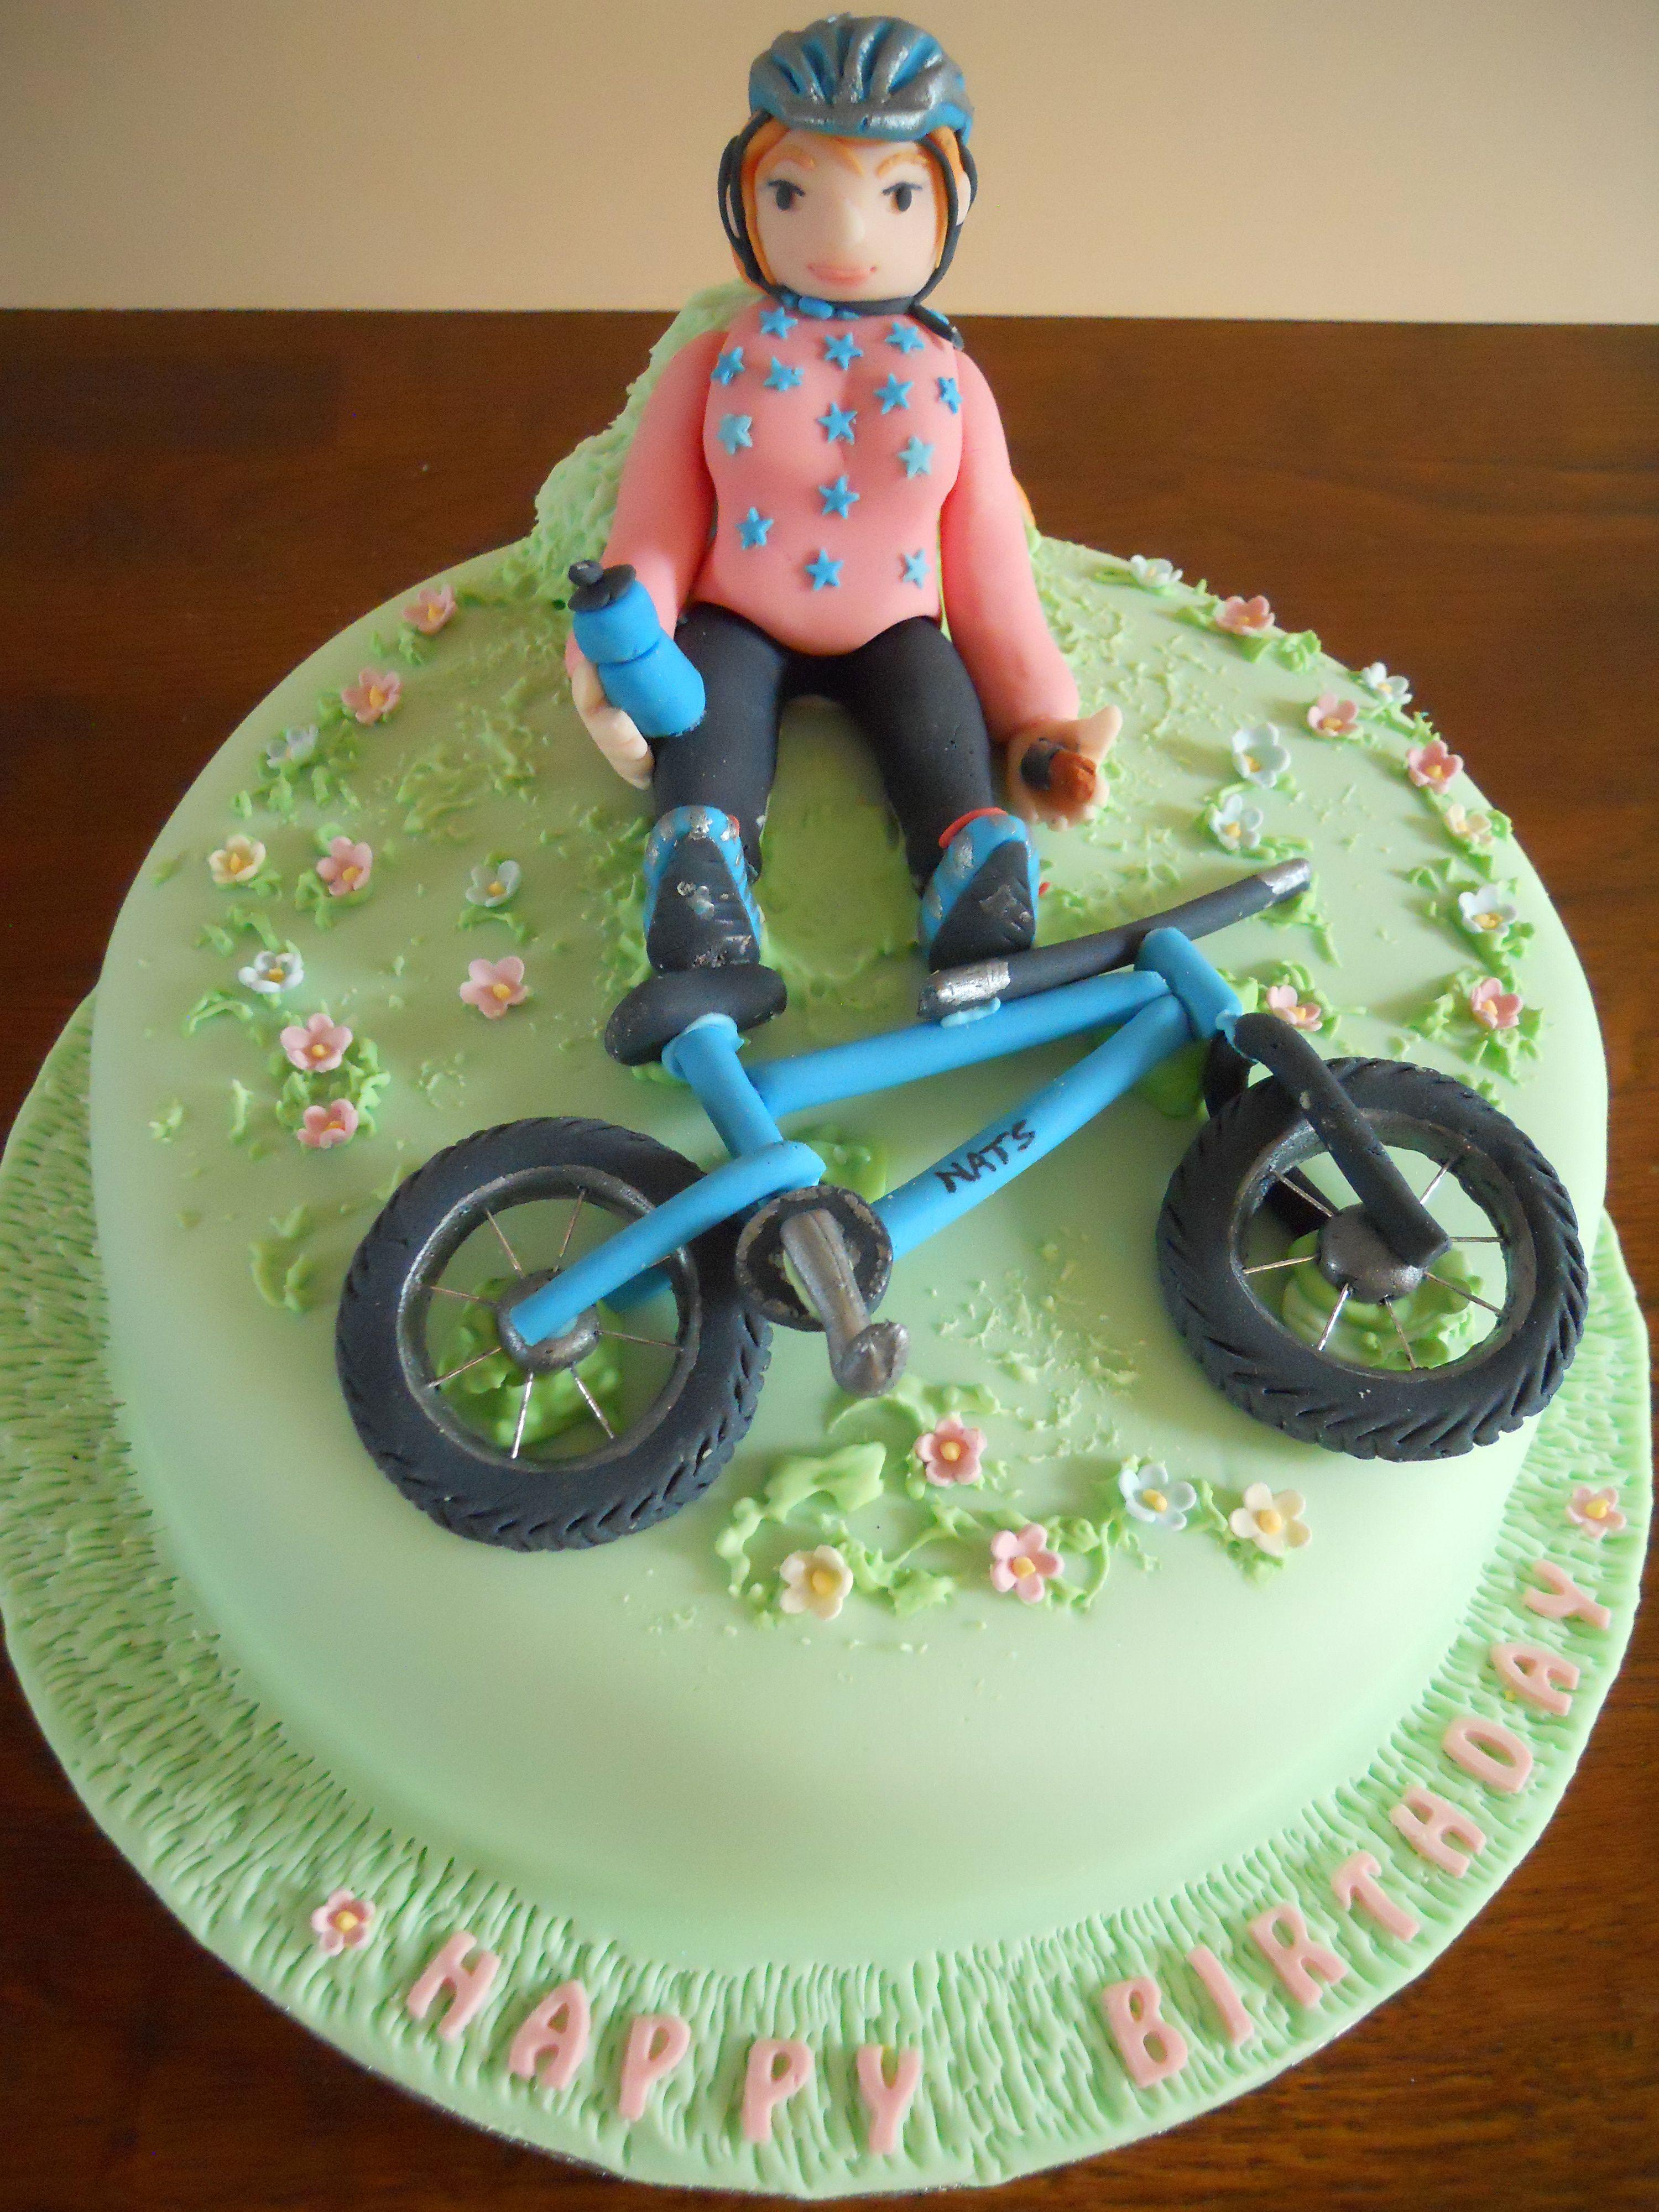 Cake Gallery Girl Bike Birthday Front View Gteau Vlo